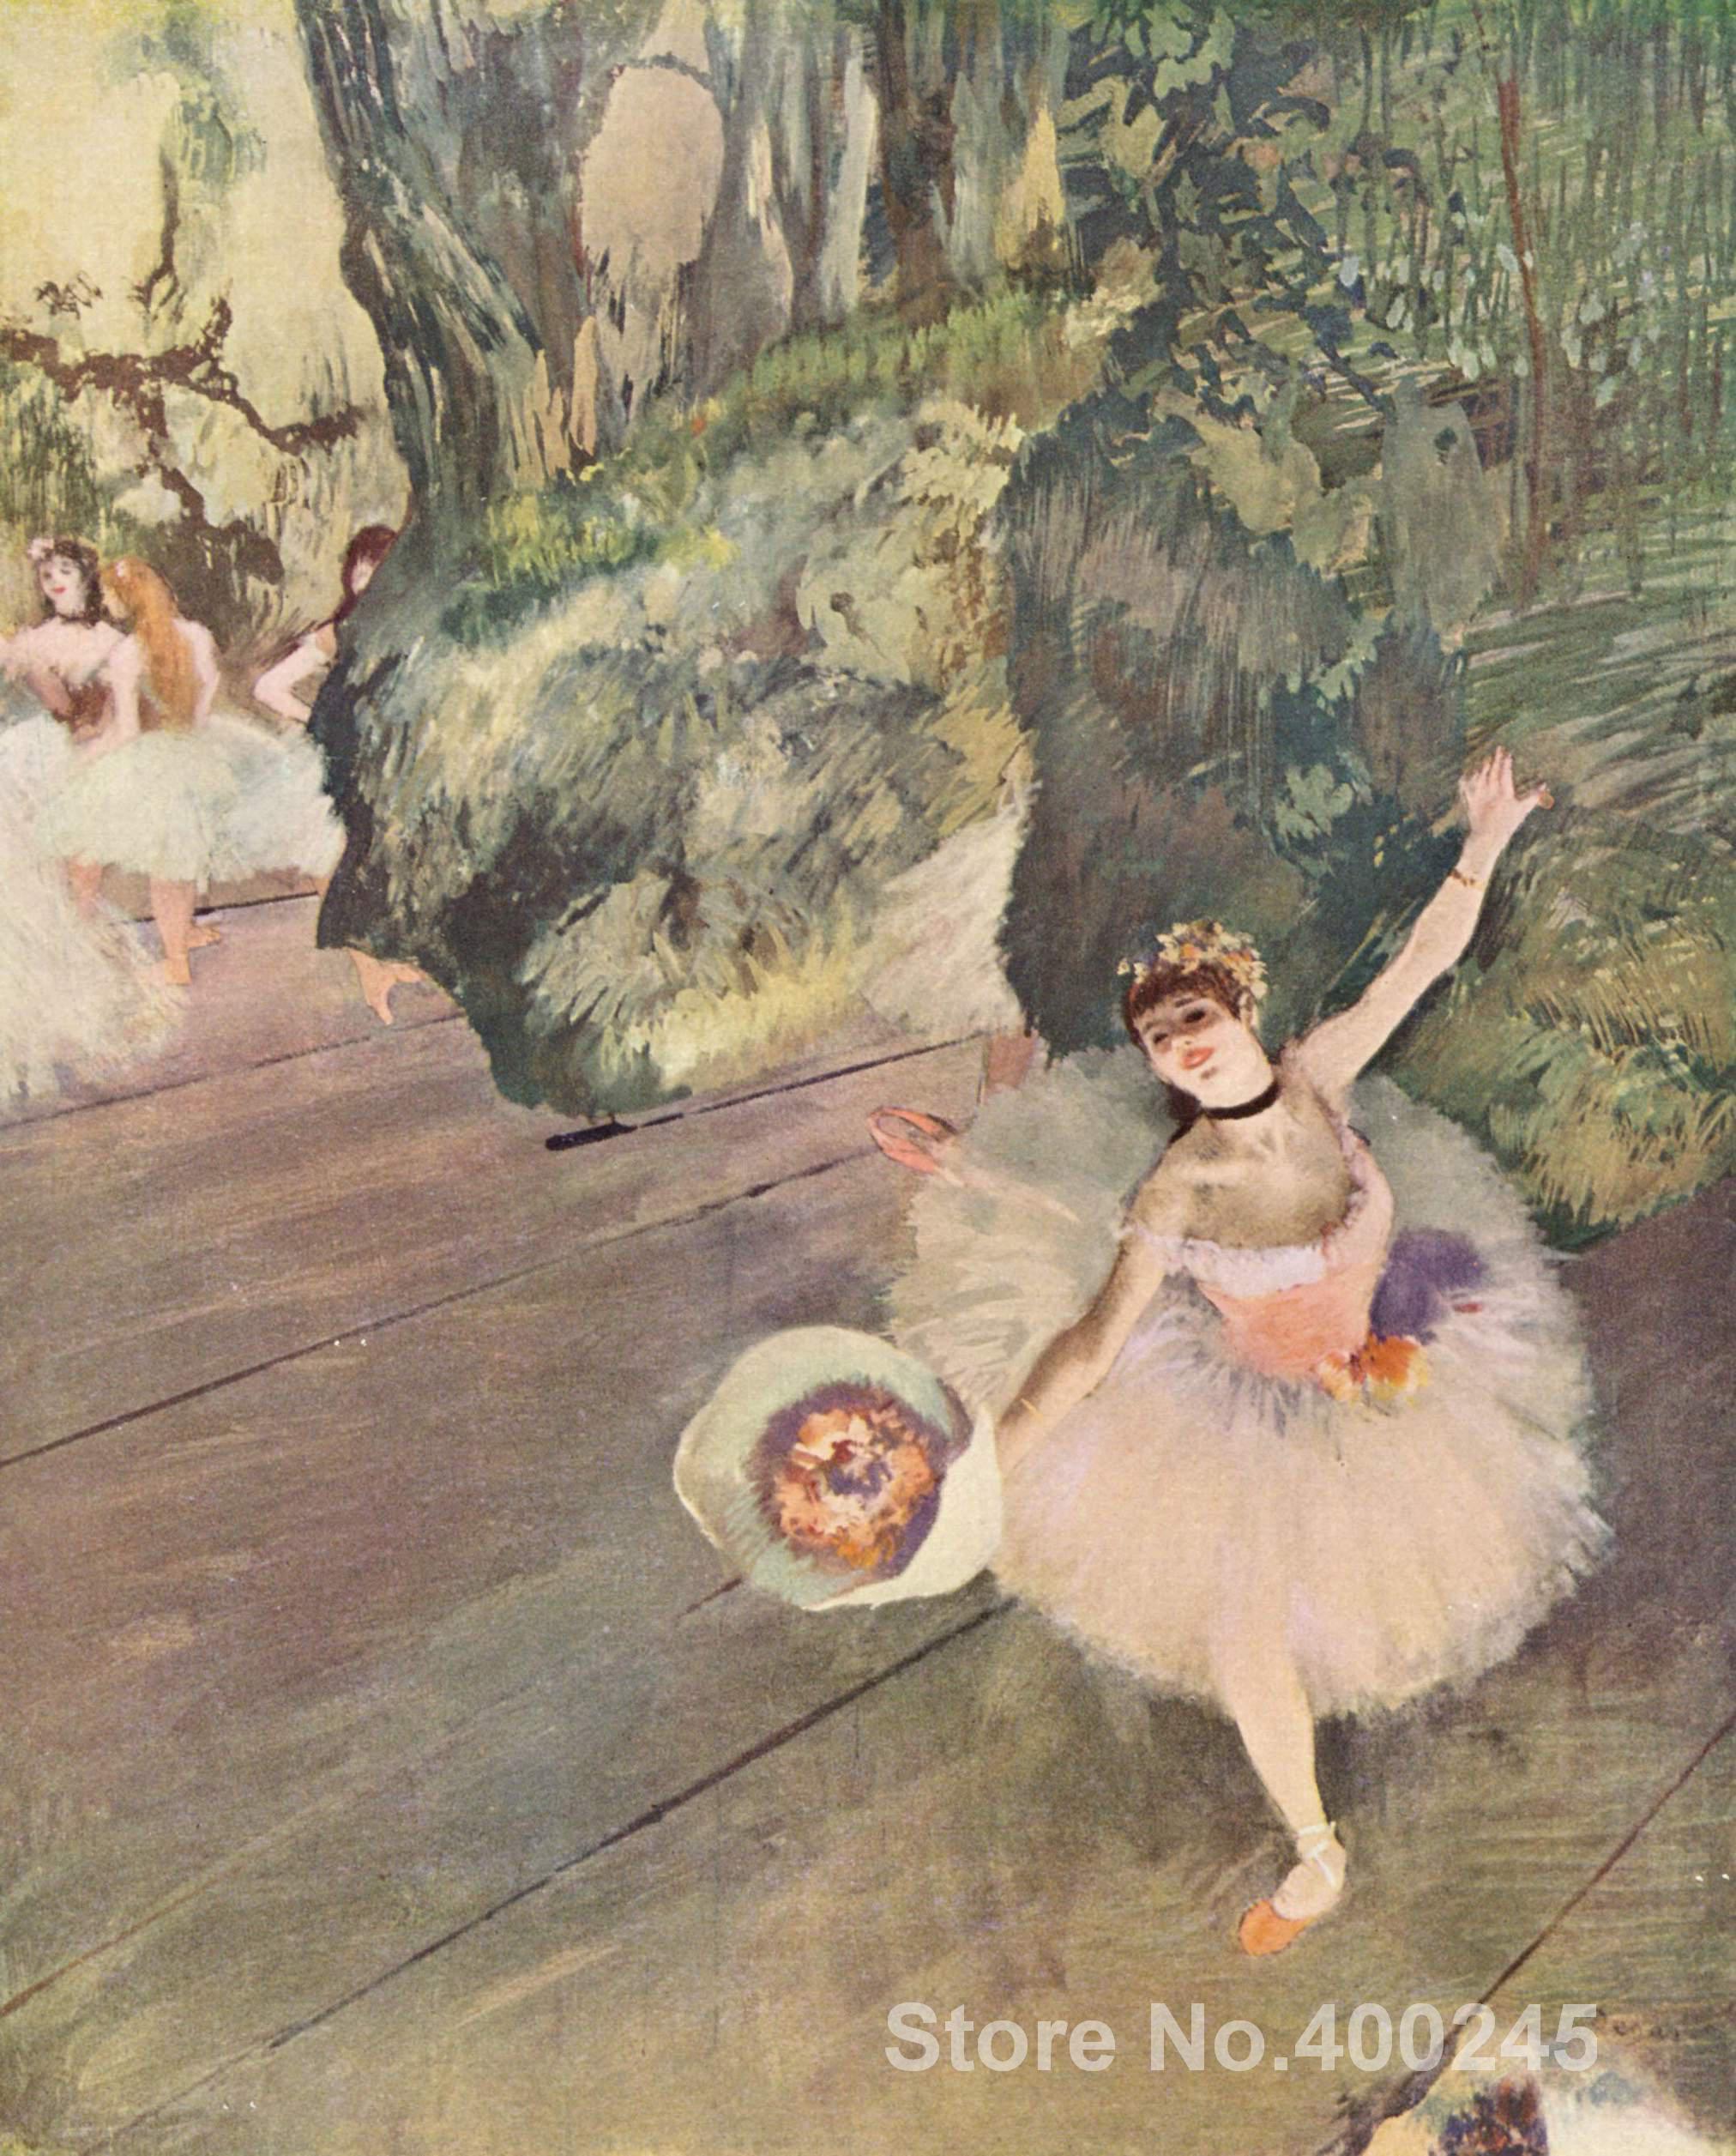 Art minyak Lukisan Penari dengan karangan bunga Bintang dari balet by edgar degas kualitas tinggi handmade